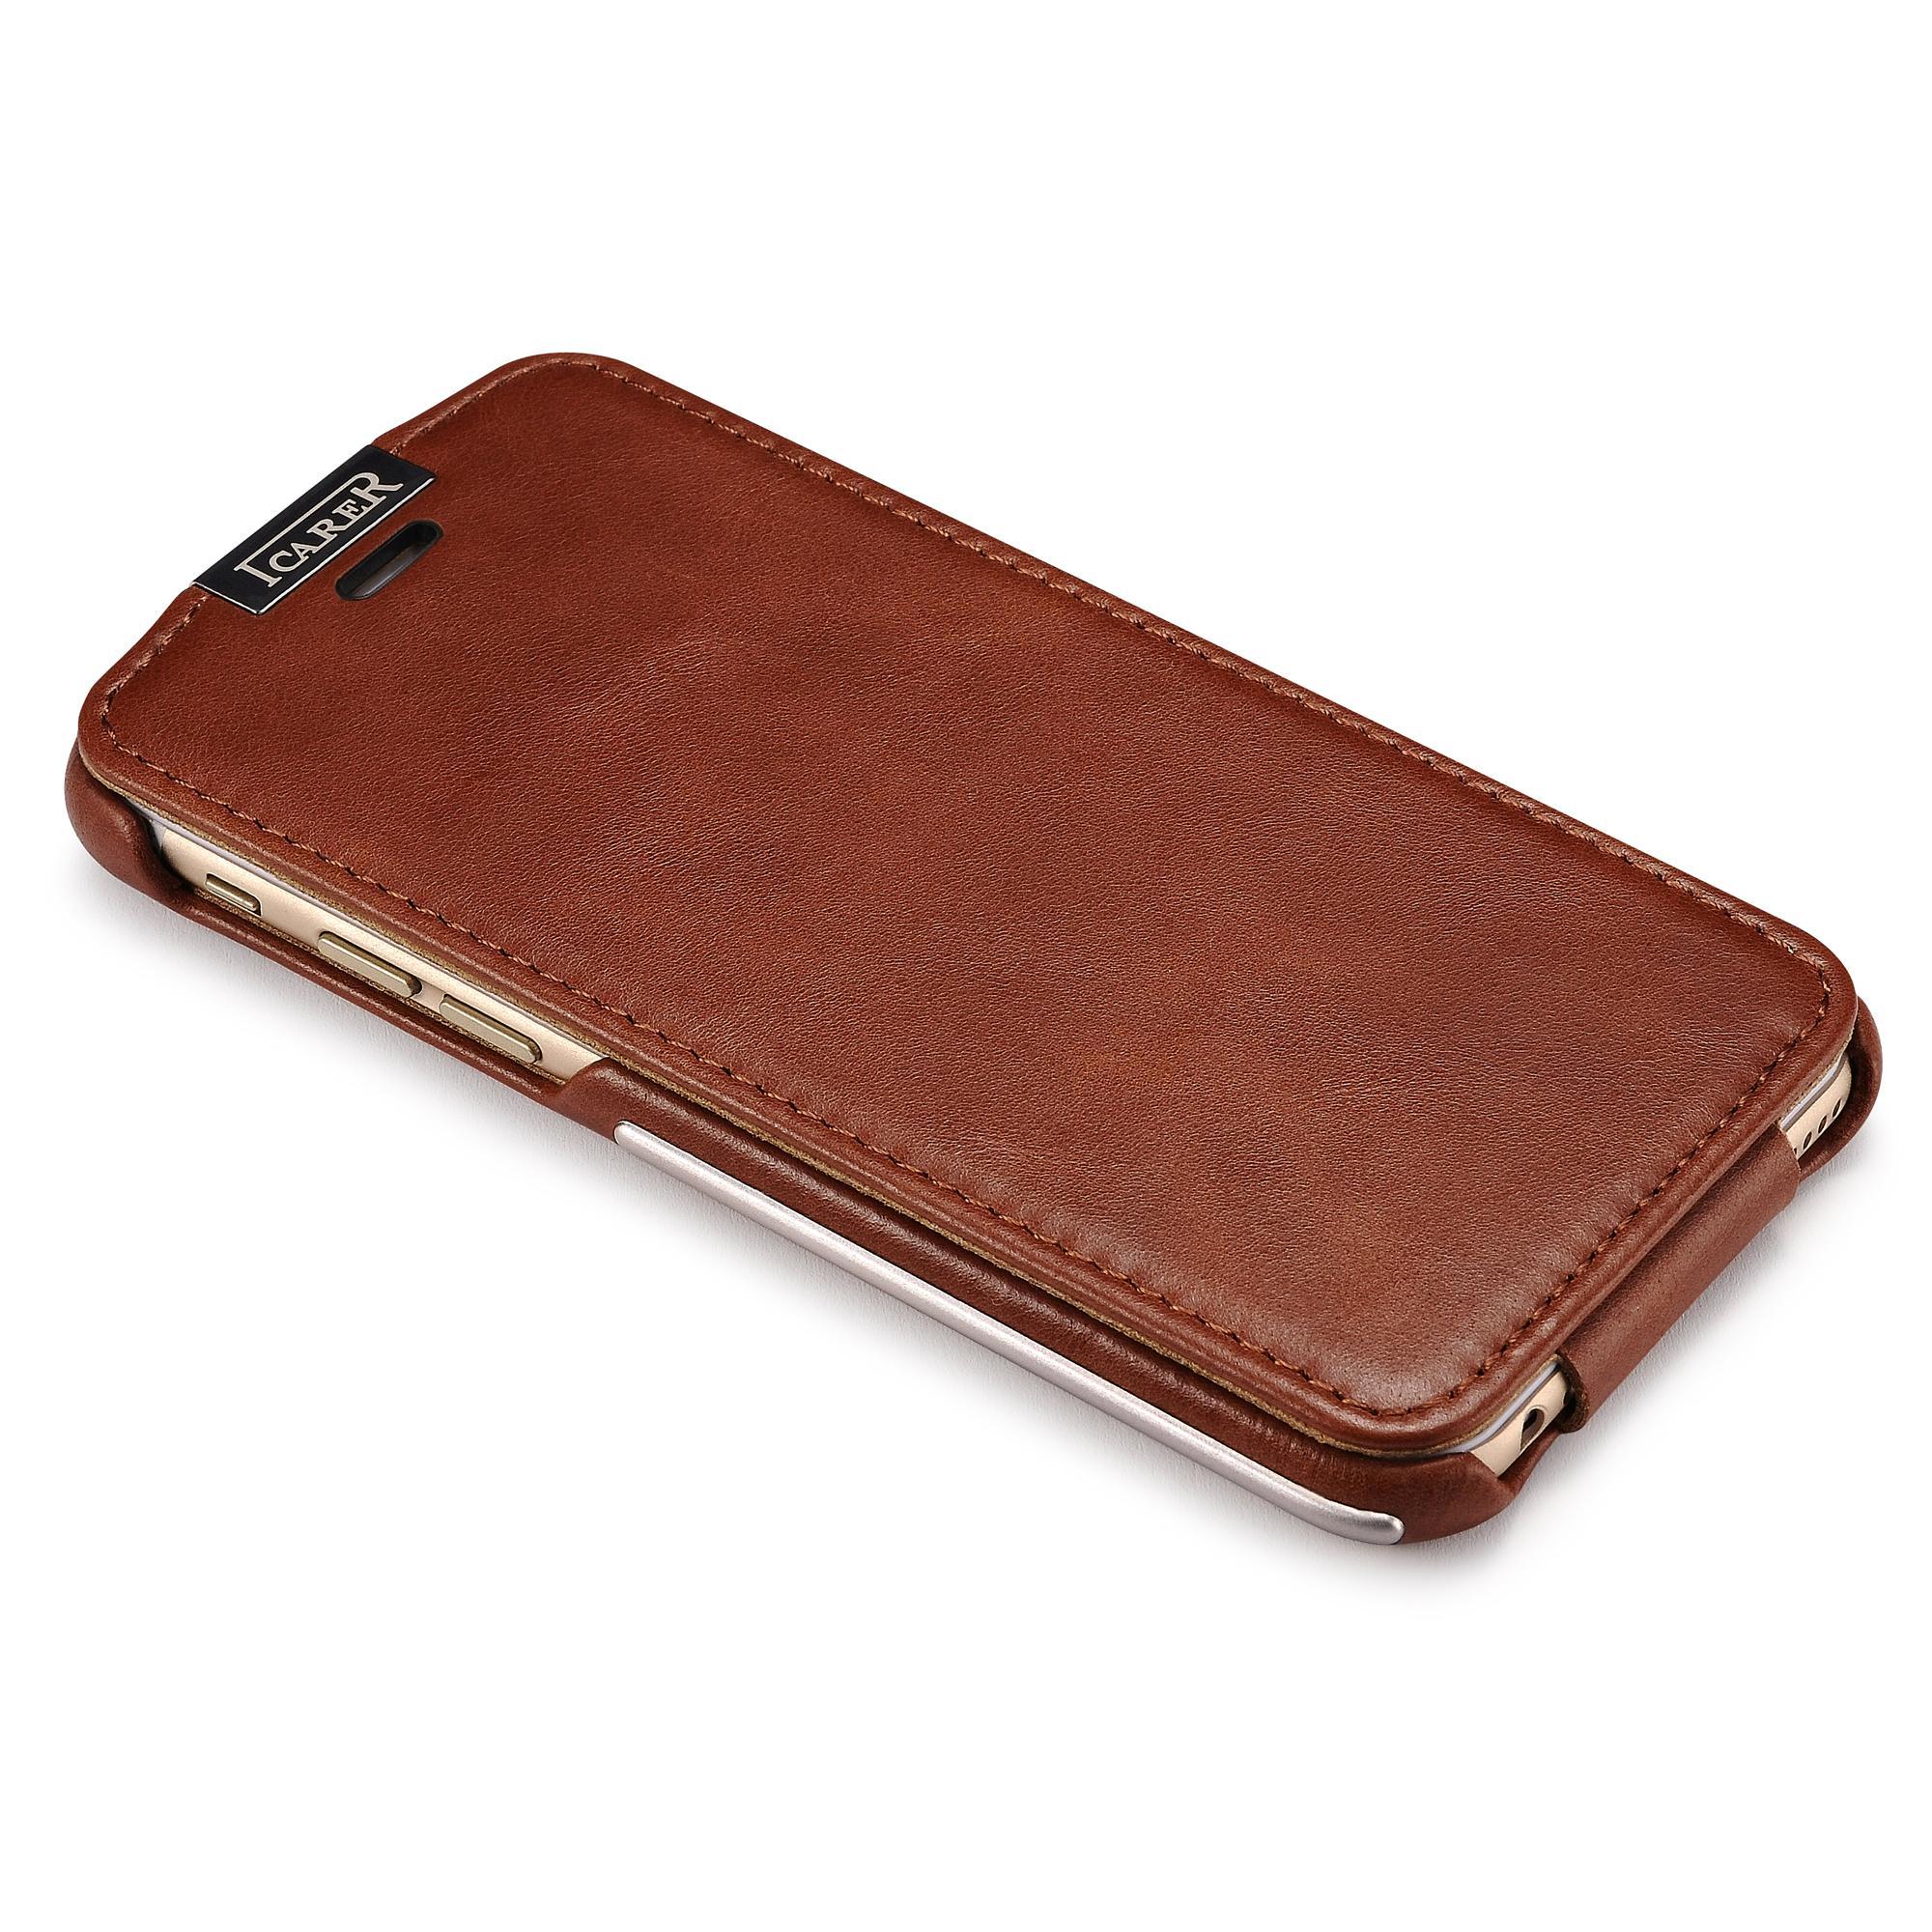 iCarer iPhone 6/6S Metal Warrior Vintage Series Magnetic Flip Leather Case 9